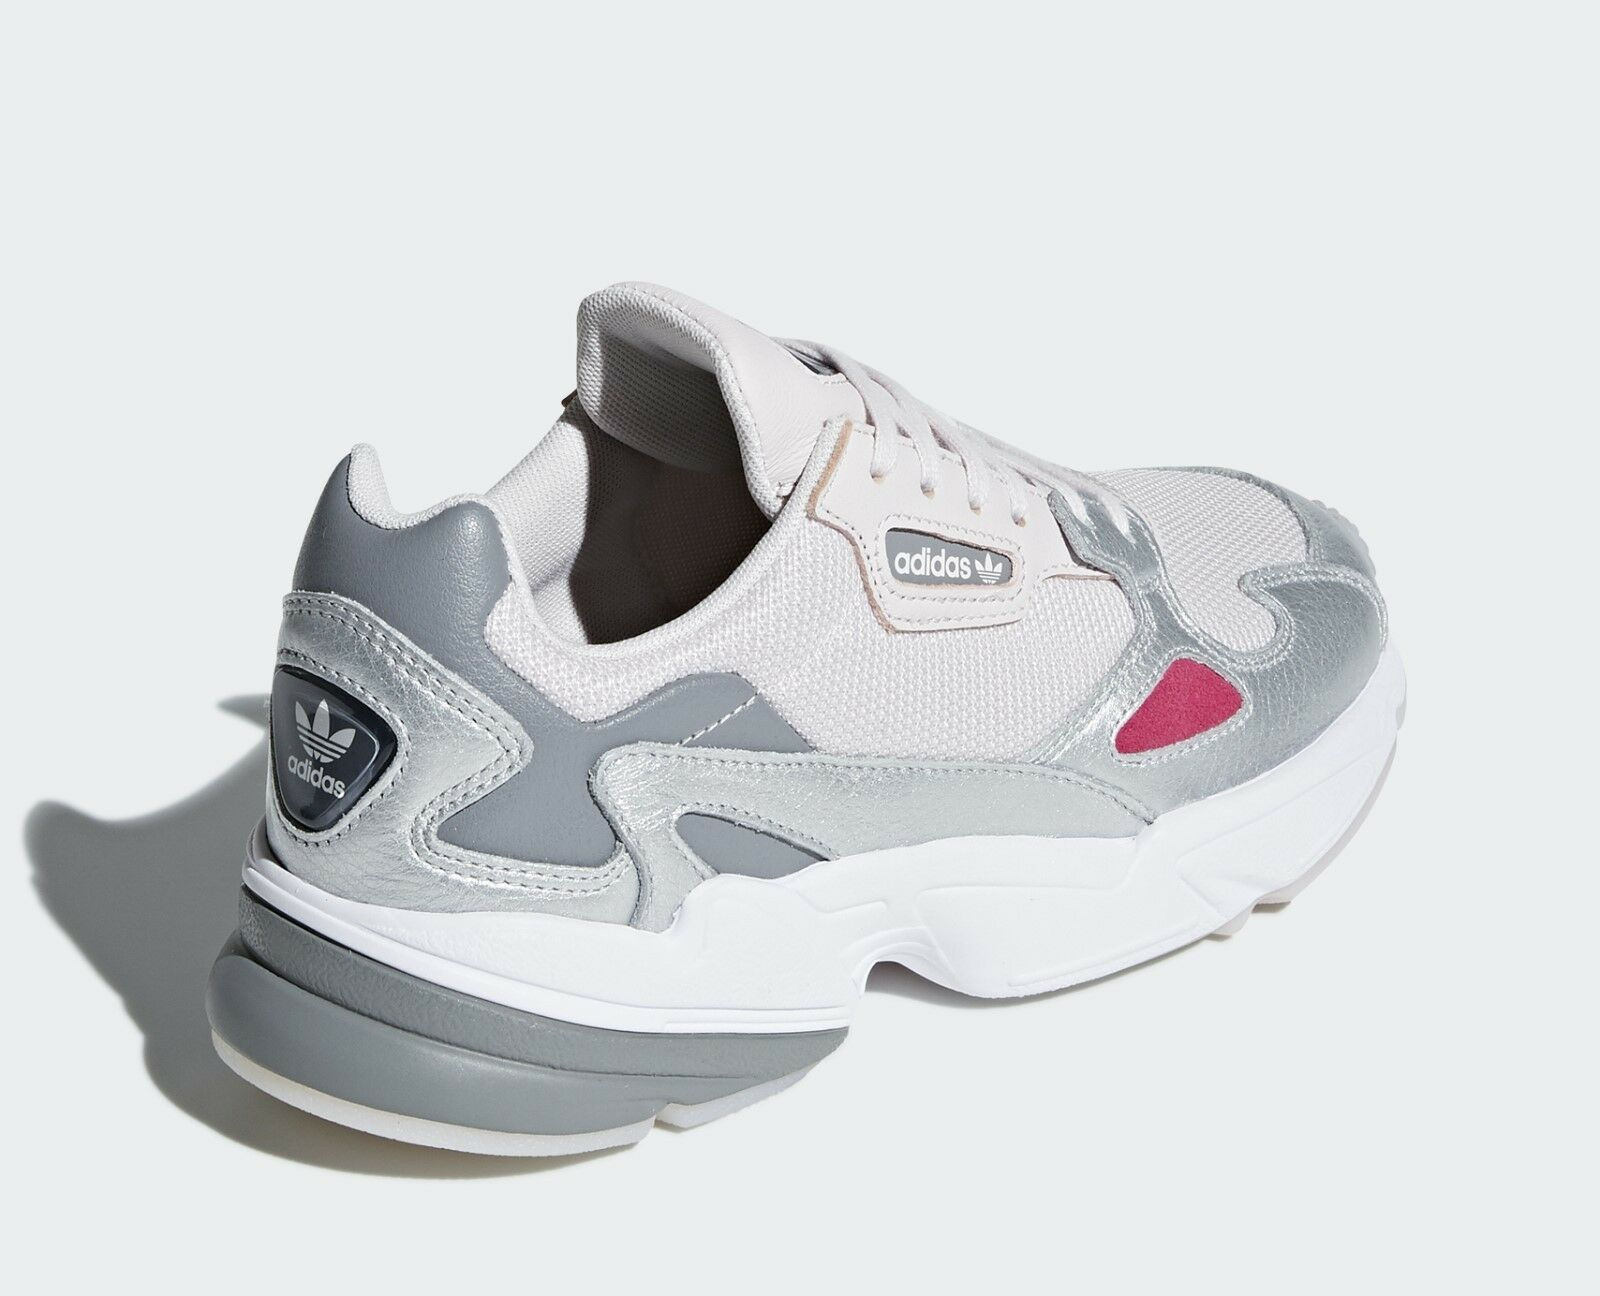 Adidas Turnschuhe Falcon Schuh D69757 Damenschuh Damenschuh Damenschuh Wolkensohle Rosa Original NEU 03a059